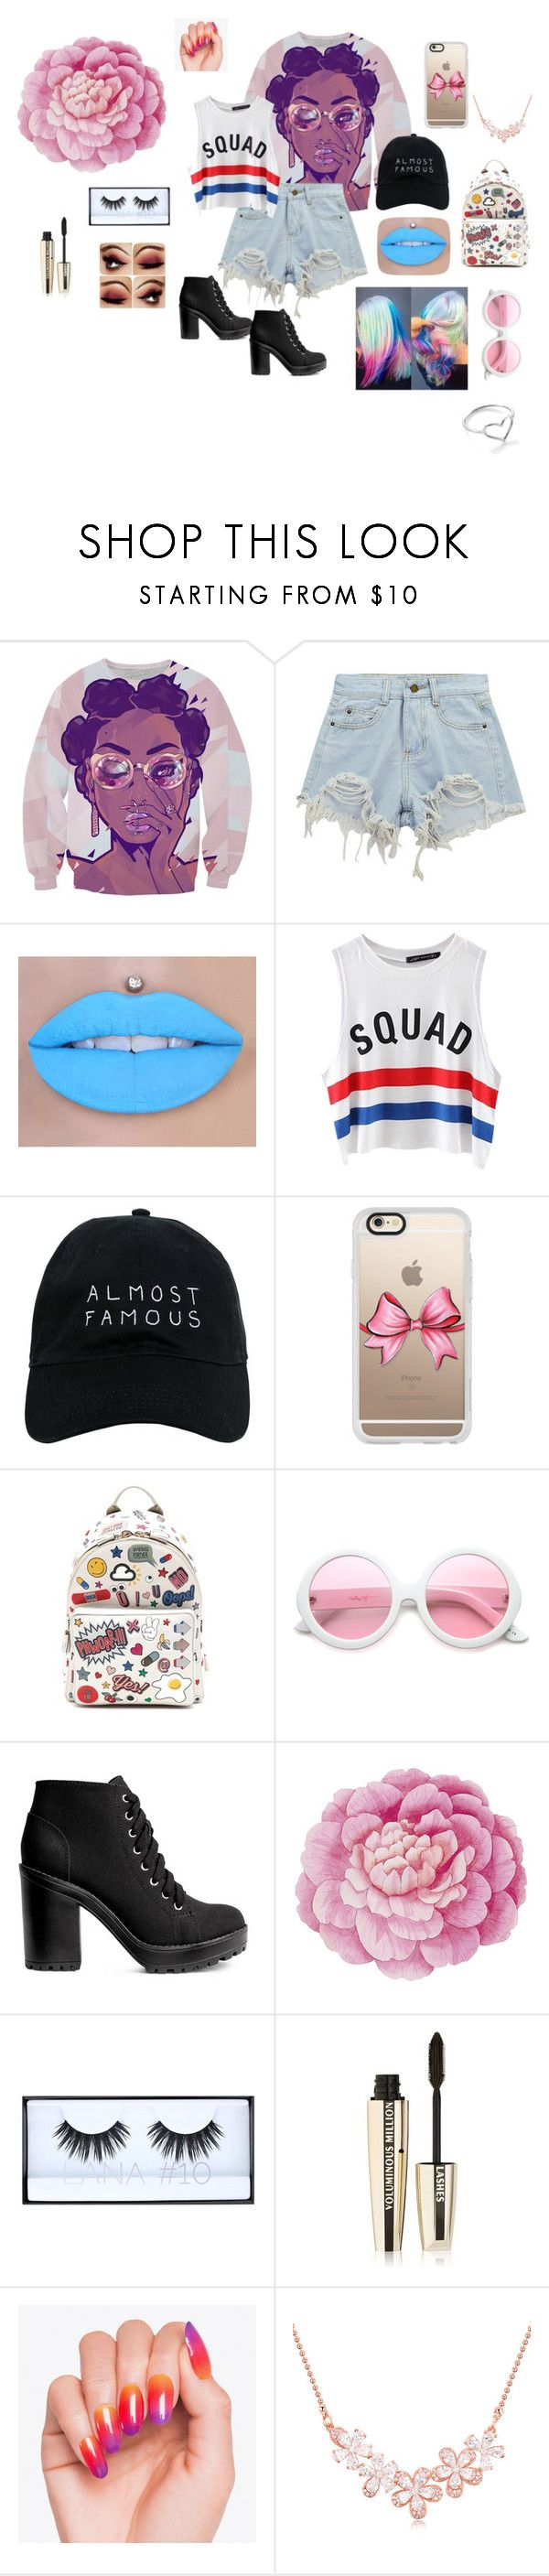 """Almost Famous"" by doggydoo346 ❤ liked on Polyvore featuring Chicnova Fashion, Nasaseasons, Casetify, Anya Hindmarch, ZeroUV, H&M, Ballard Designs, Huda Beauty, L'Oréal Paris and Jordan Askill"